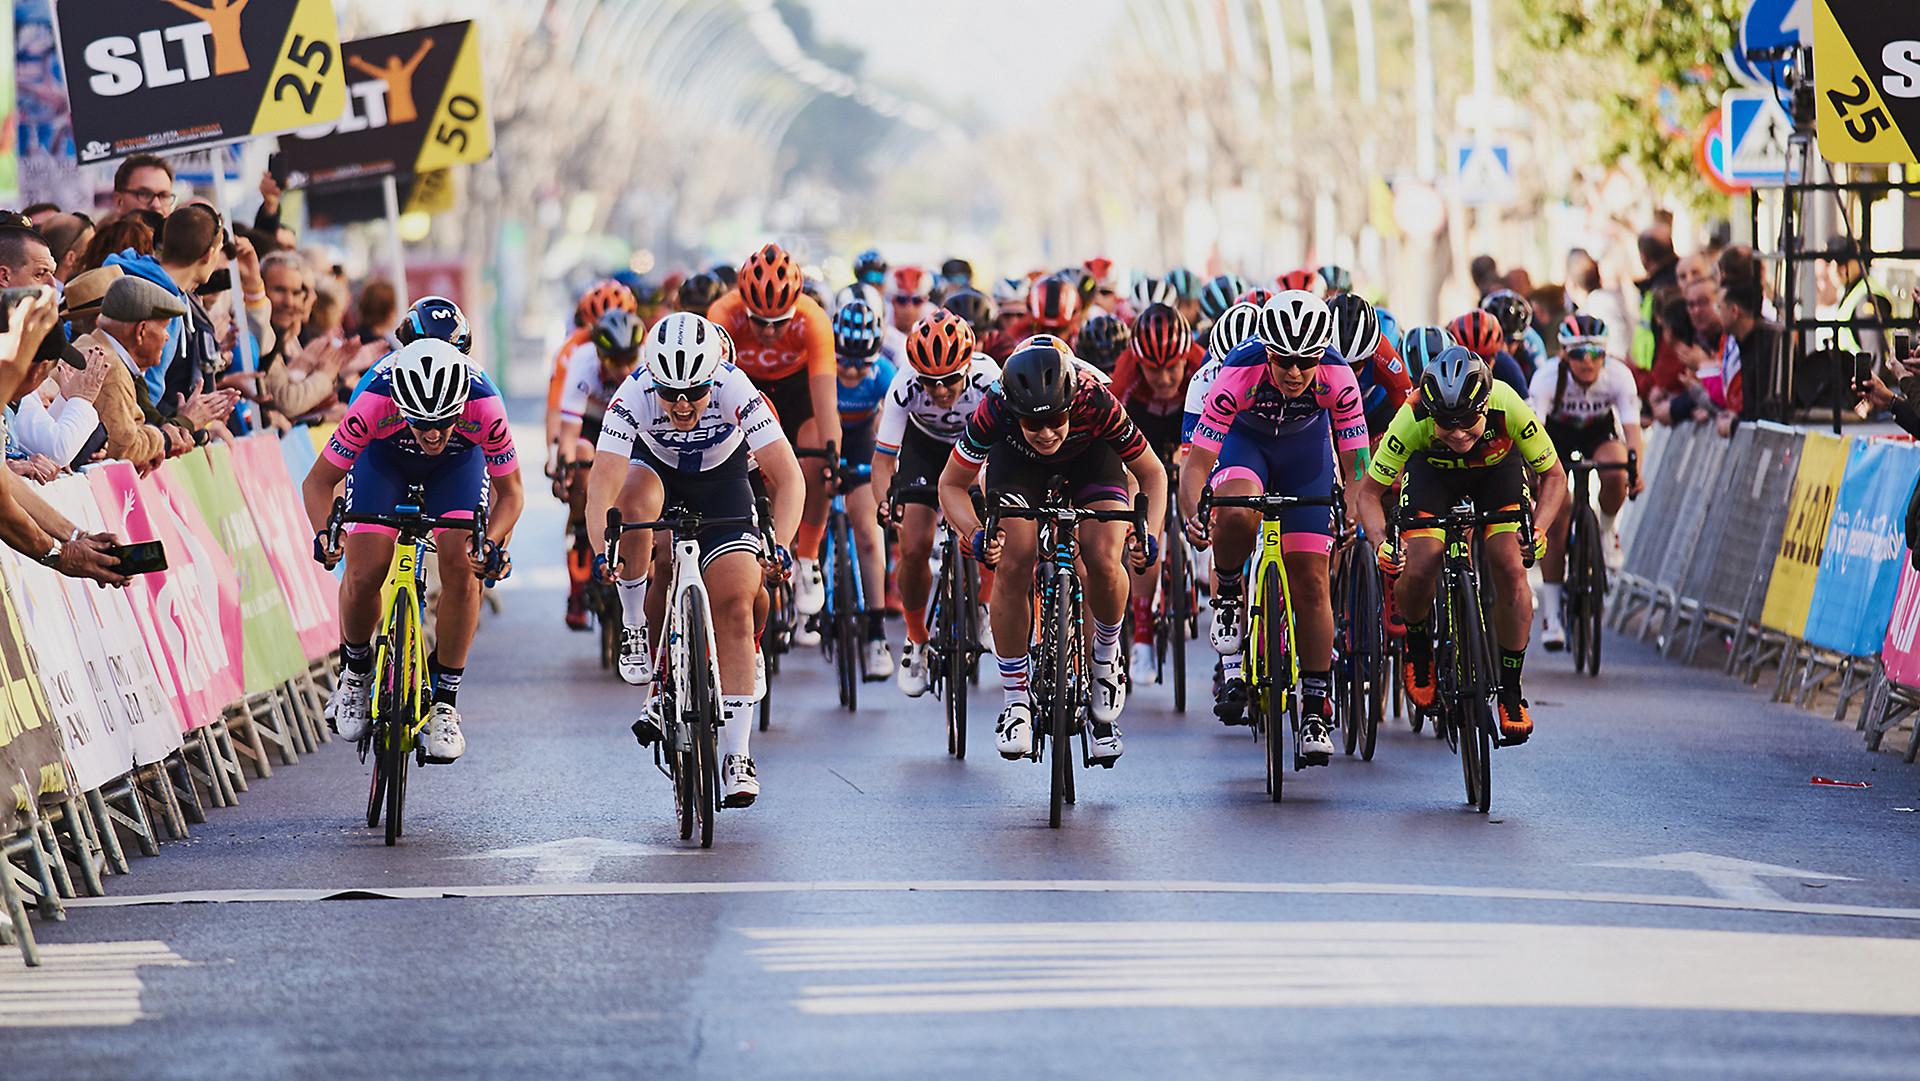 4639873b028 Trek Bikes - The world's best bikes and cycling gear | Trek Bikes